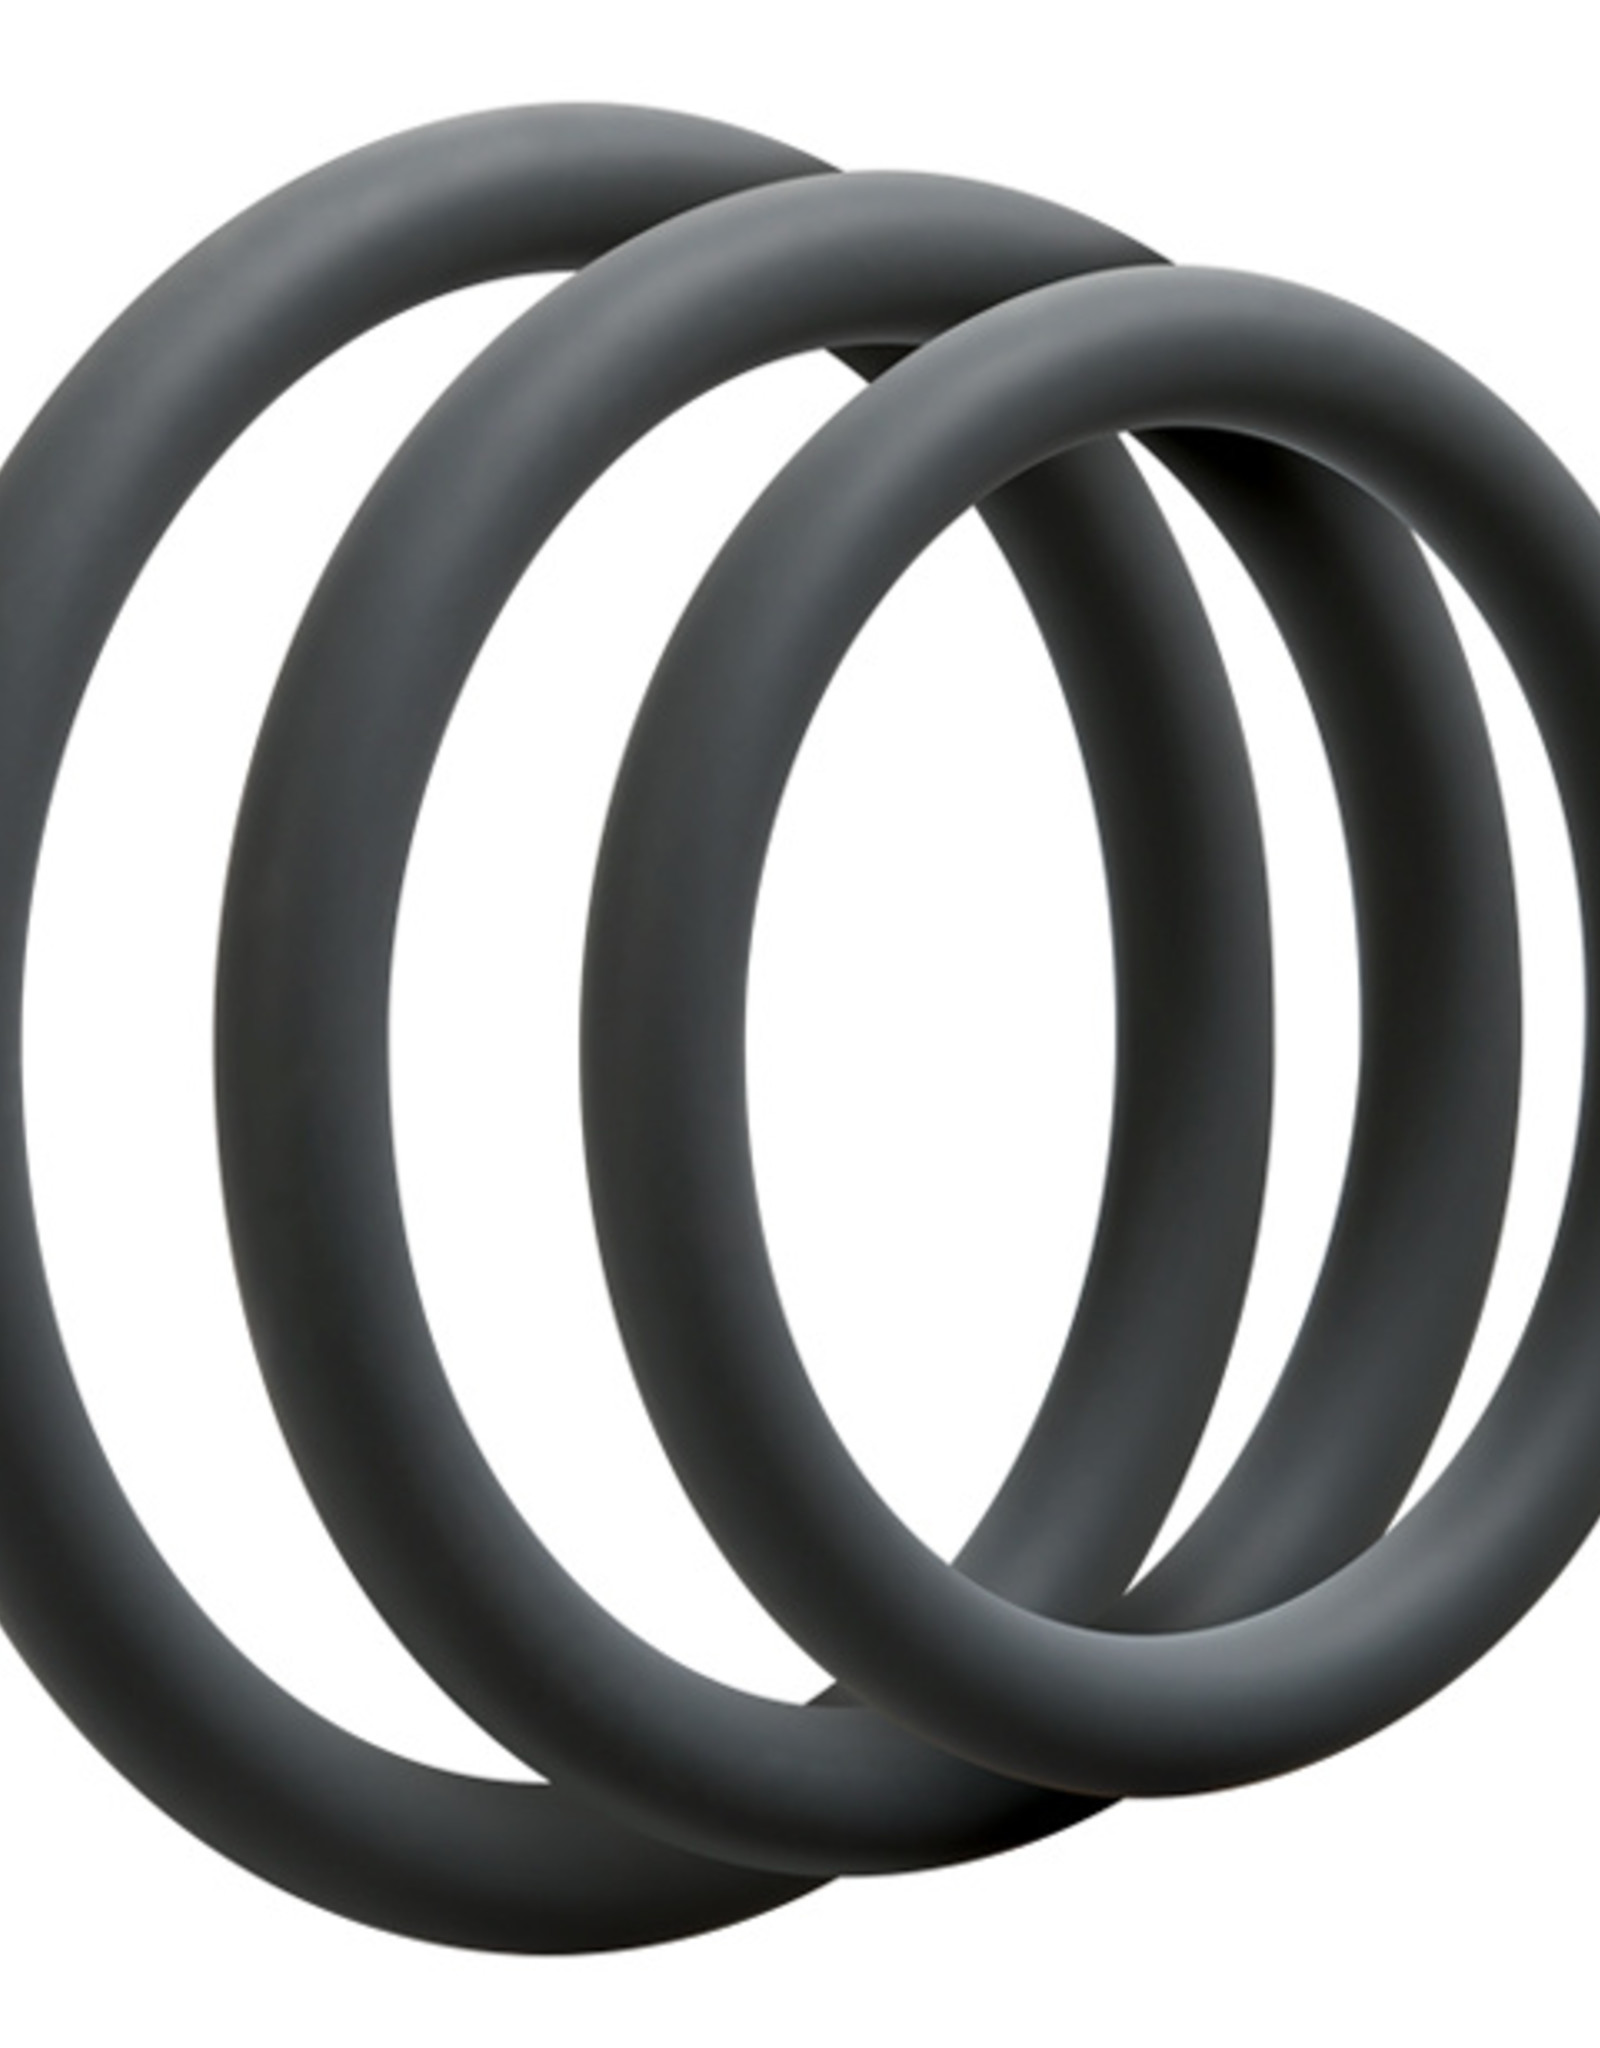 Doc Johnson Optimale 3 C-Ring Set